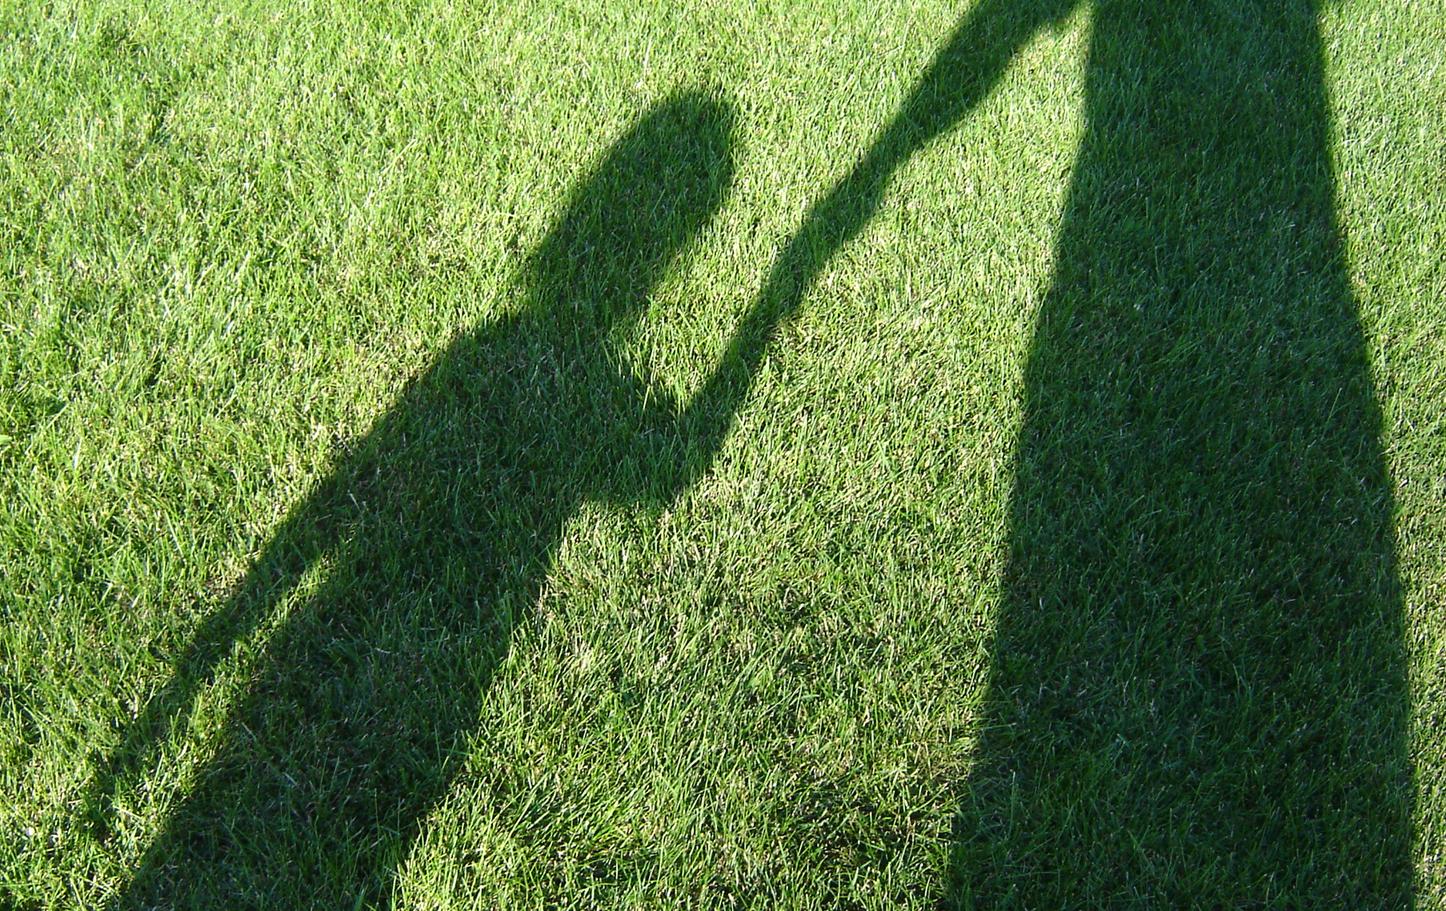 Hineni: Failing My Children's Sense of Security?